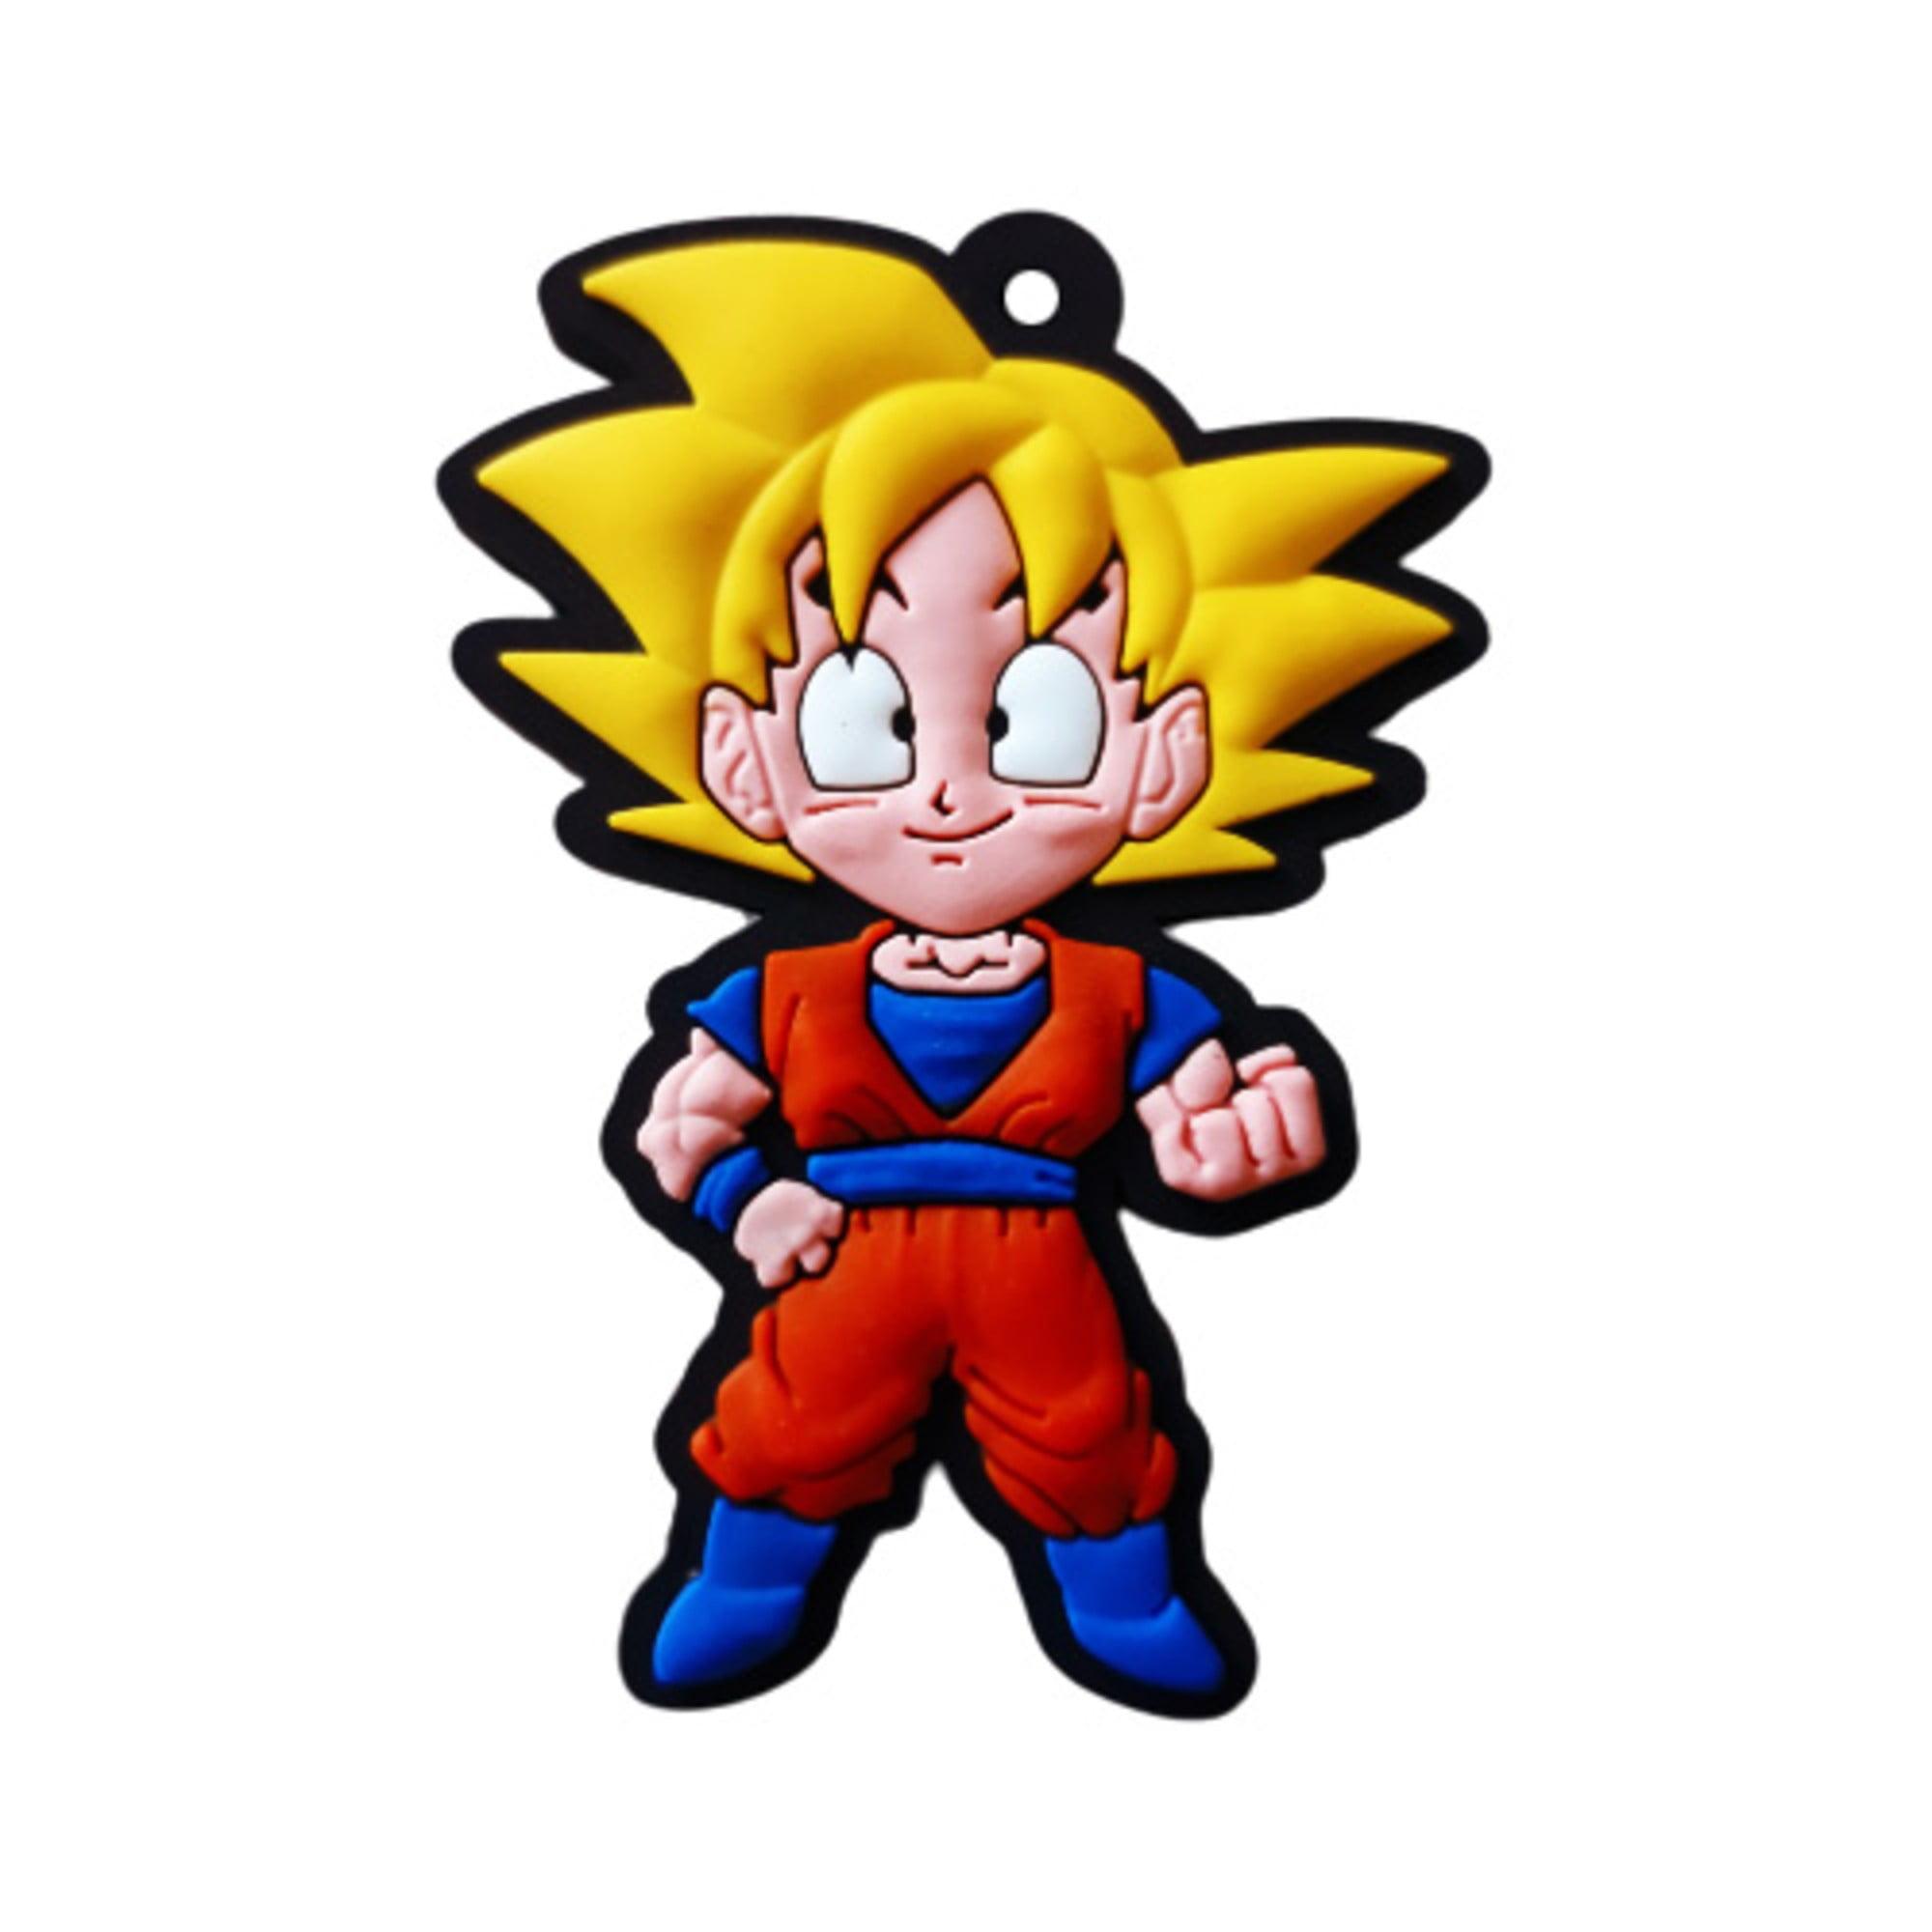 Chaveiro Geek - Goku (Super Sayajin)